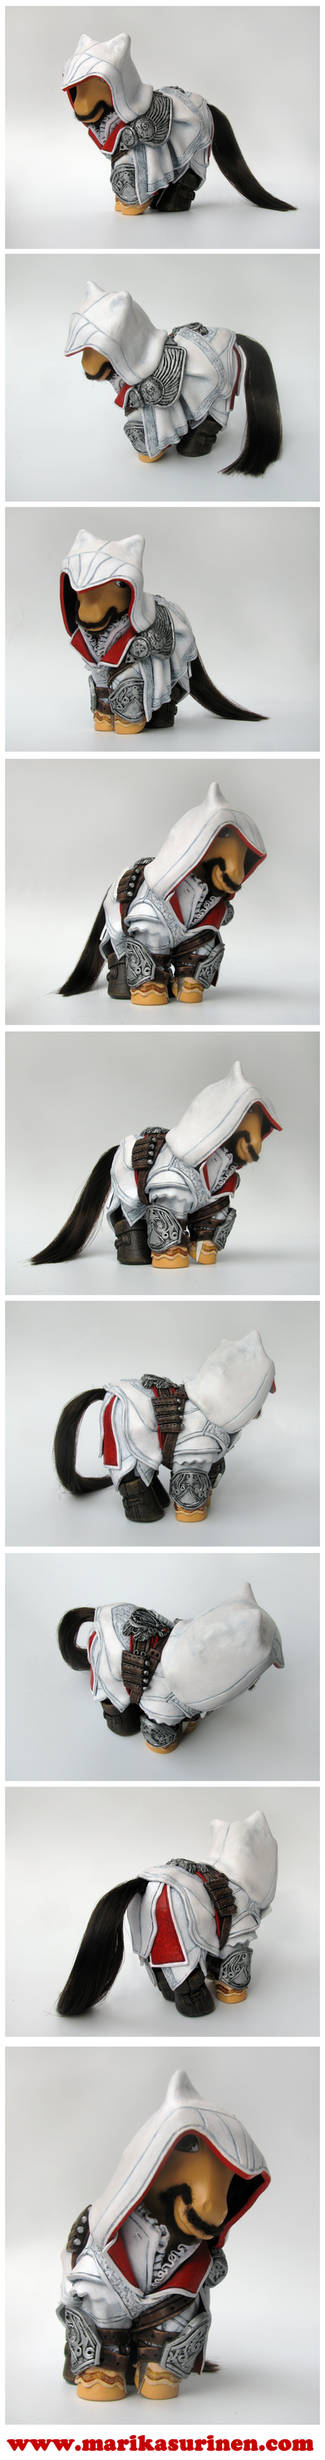 My Little Ezio Auditore